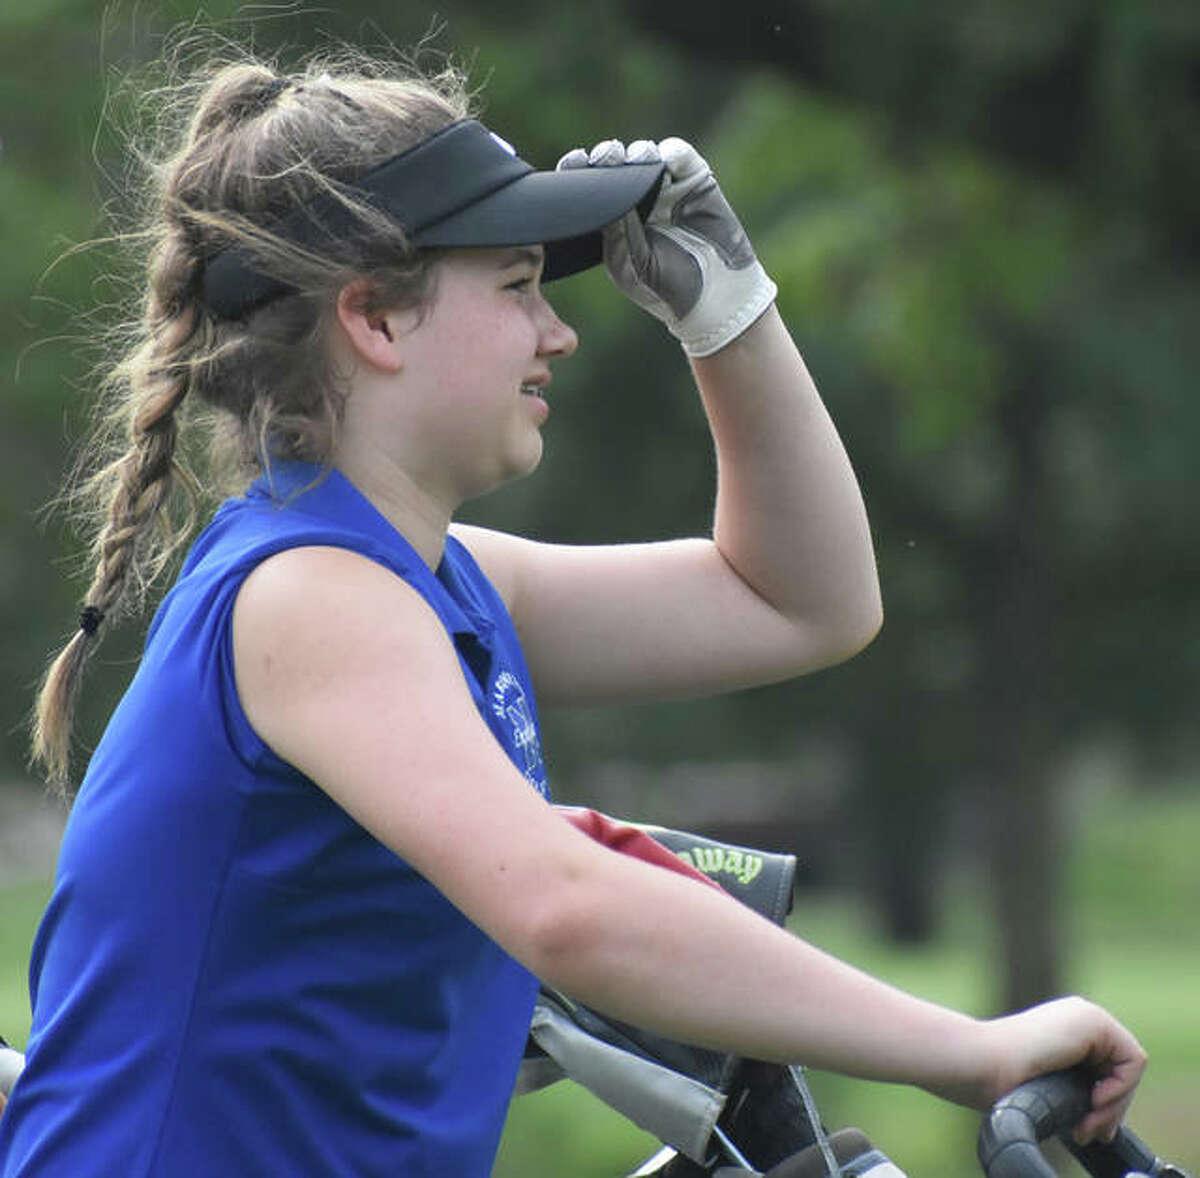 Marquette Catholic sophomore Audrey Cain shot 80 Monday at the Metro East Shootout girls golf tournament.